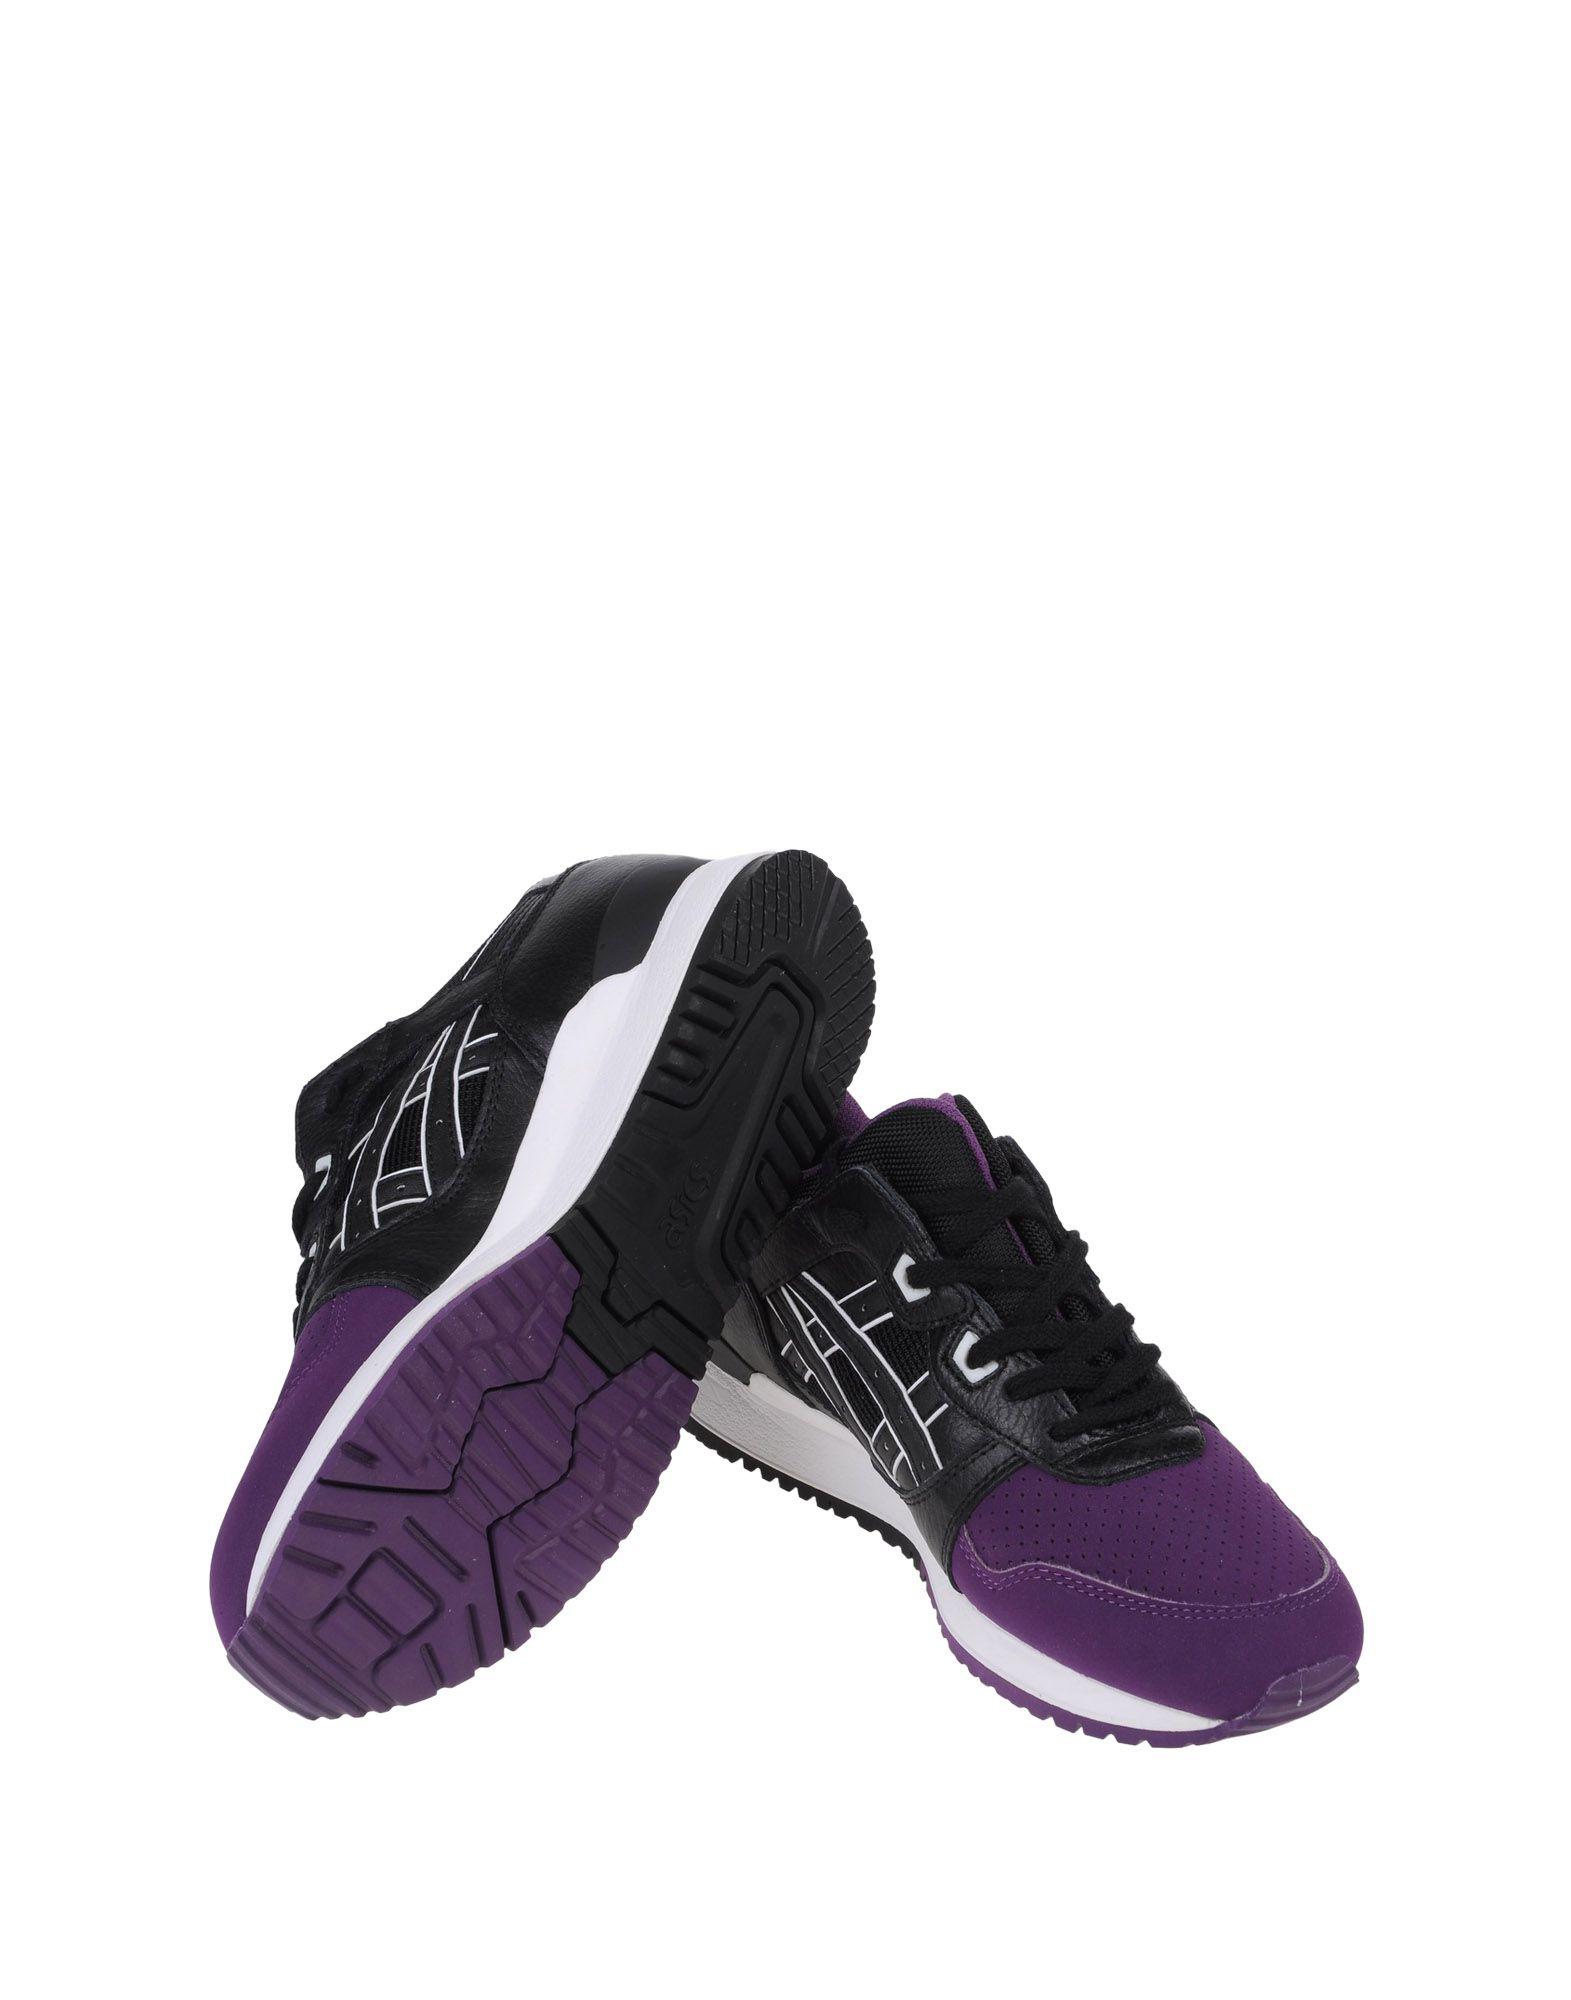 Sneakers Asics Tiger Gel Lyte Iii - Femme - Sneakers Asics Tiger sur